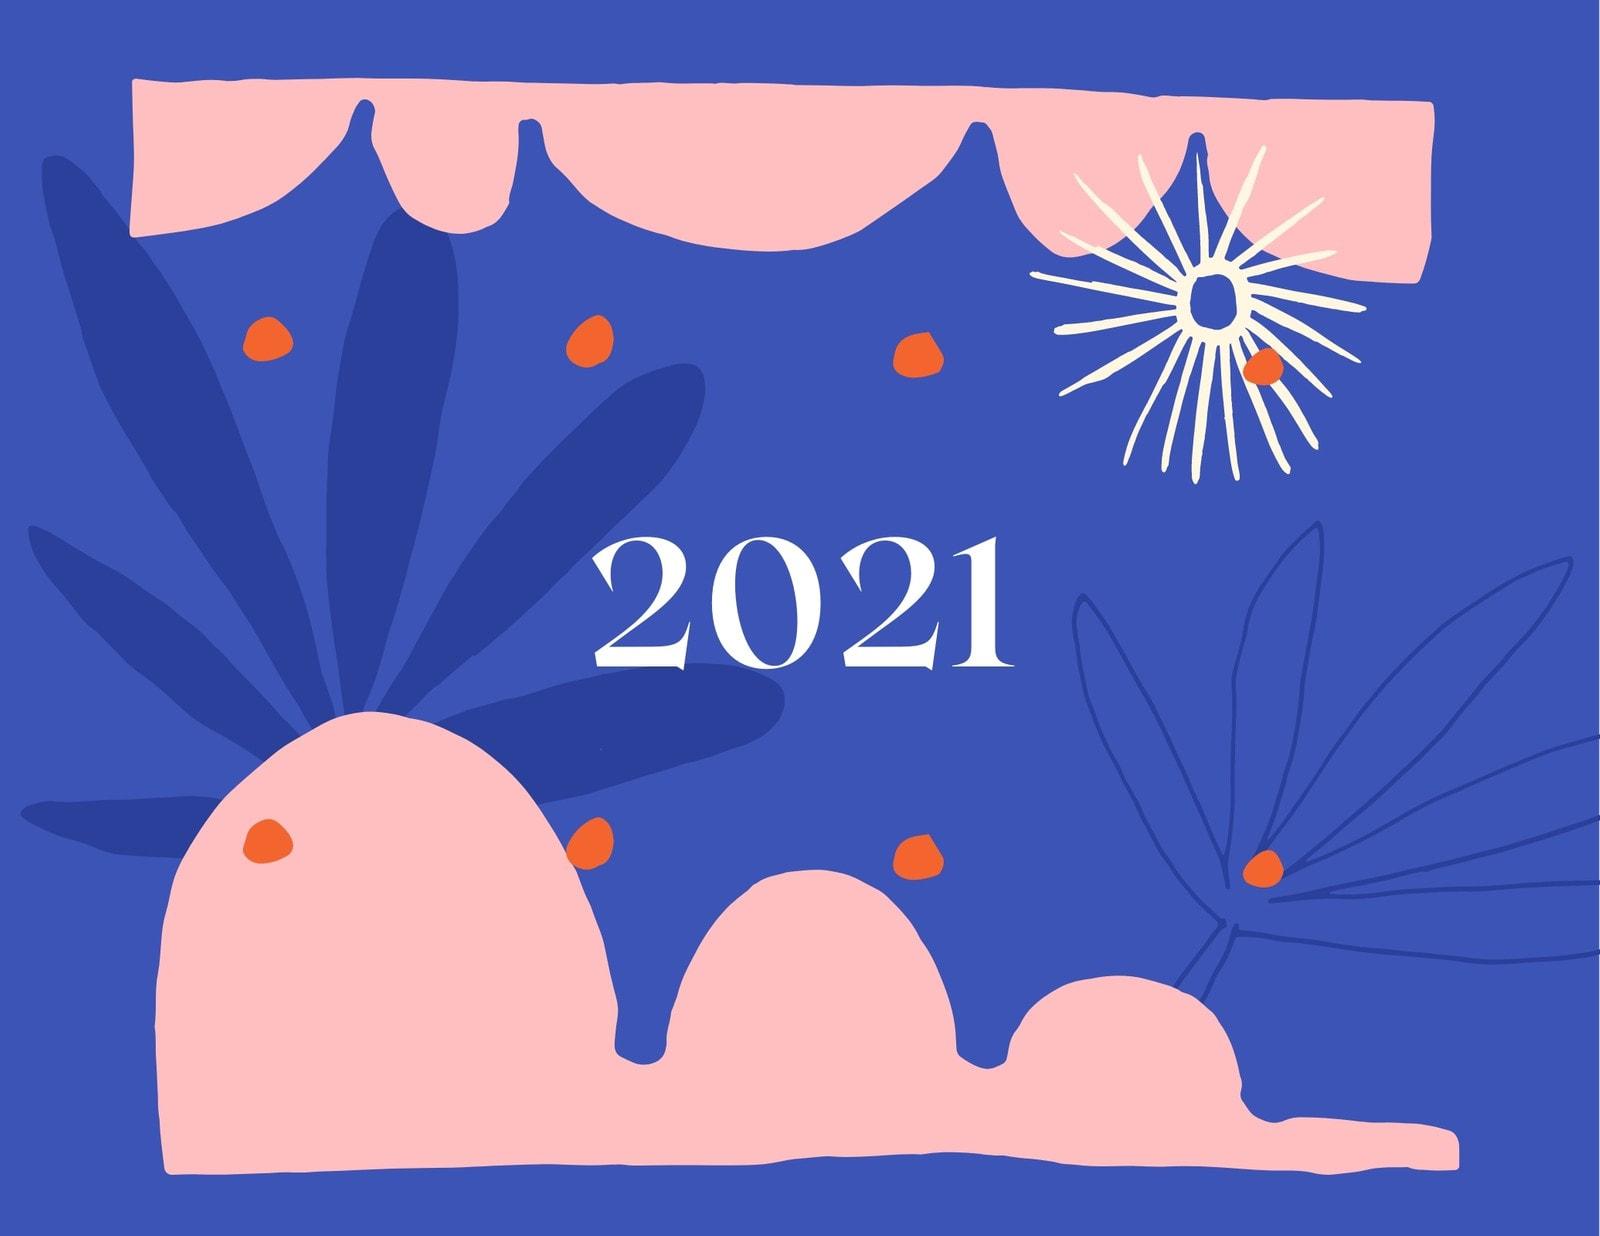 Blue Orange and Pink Handmade Organic Women Wall Calendar